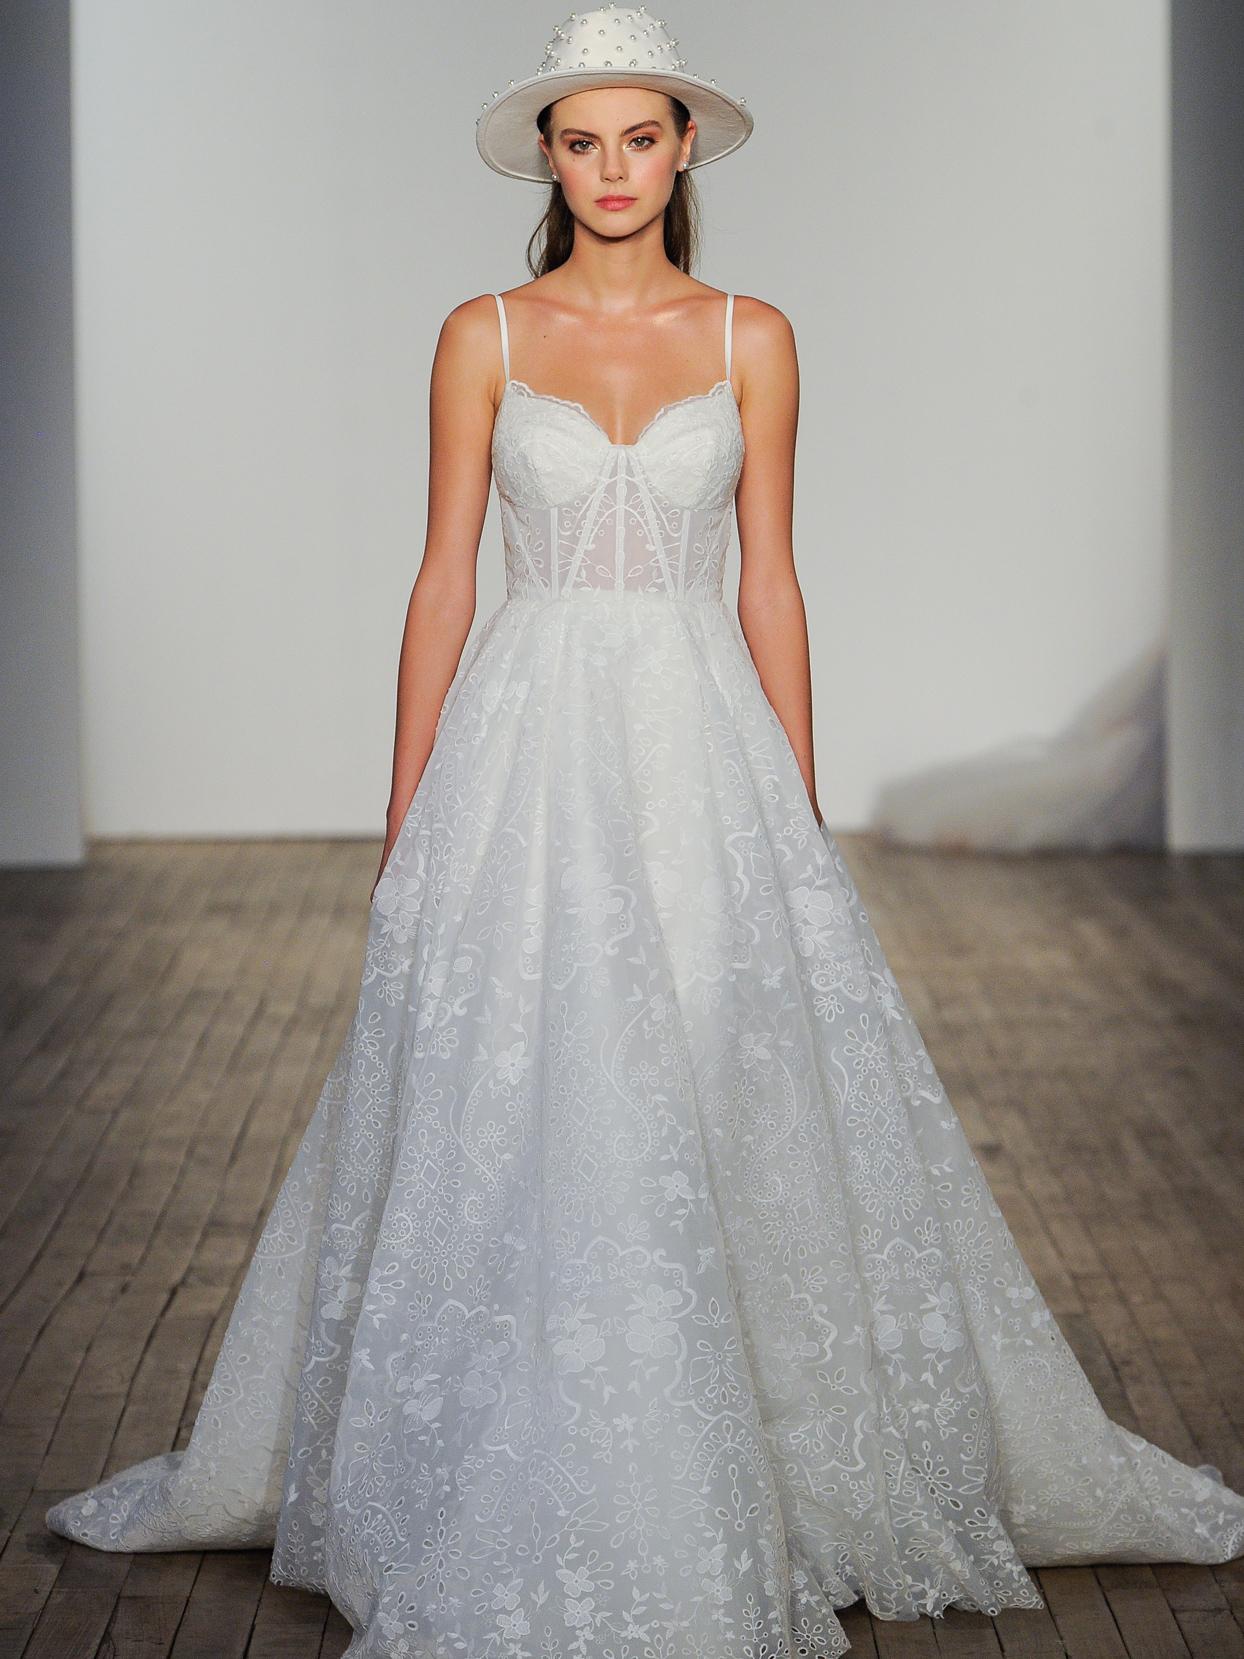 Hayley Paige spaghetti strap sheer corset A-line wedding dress fall 2020